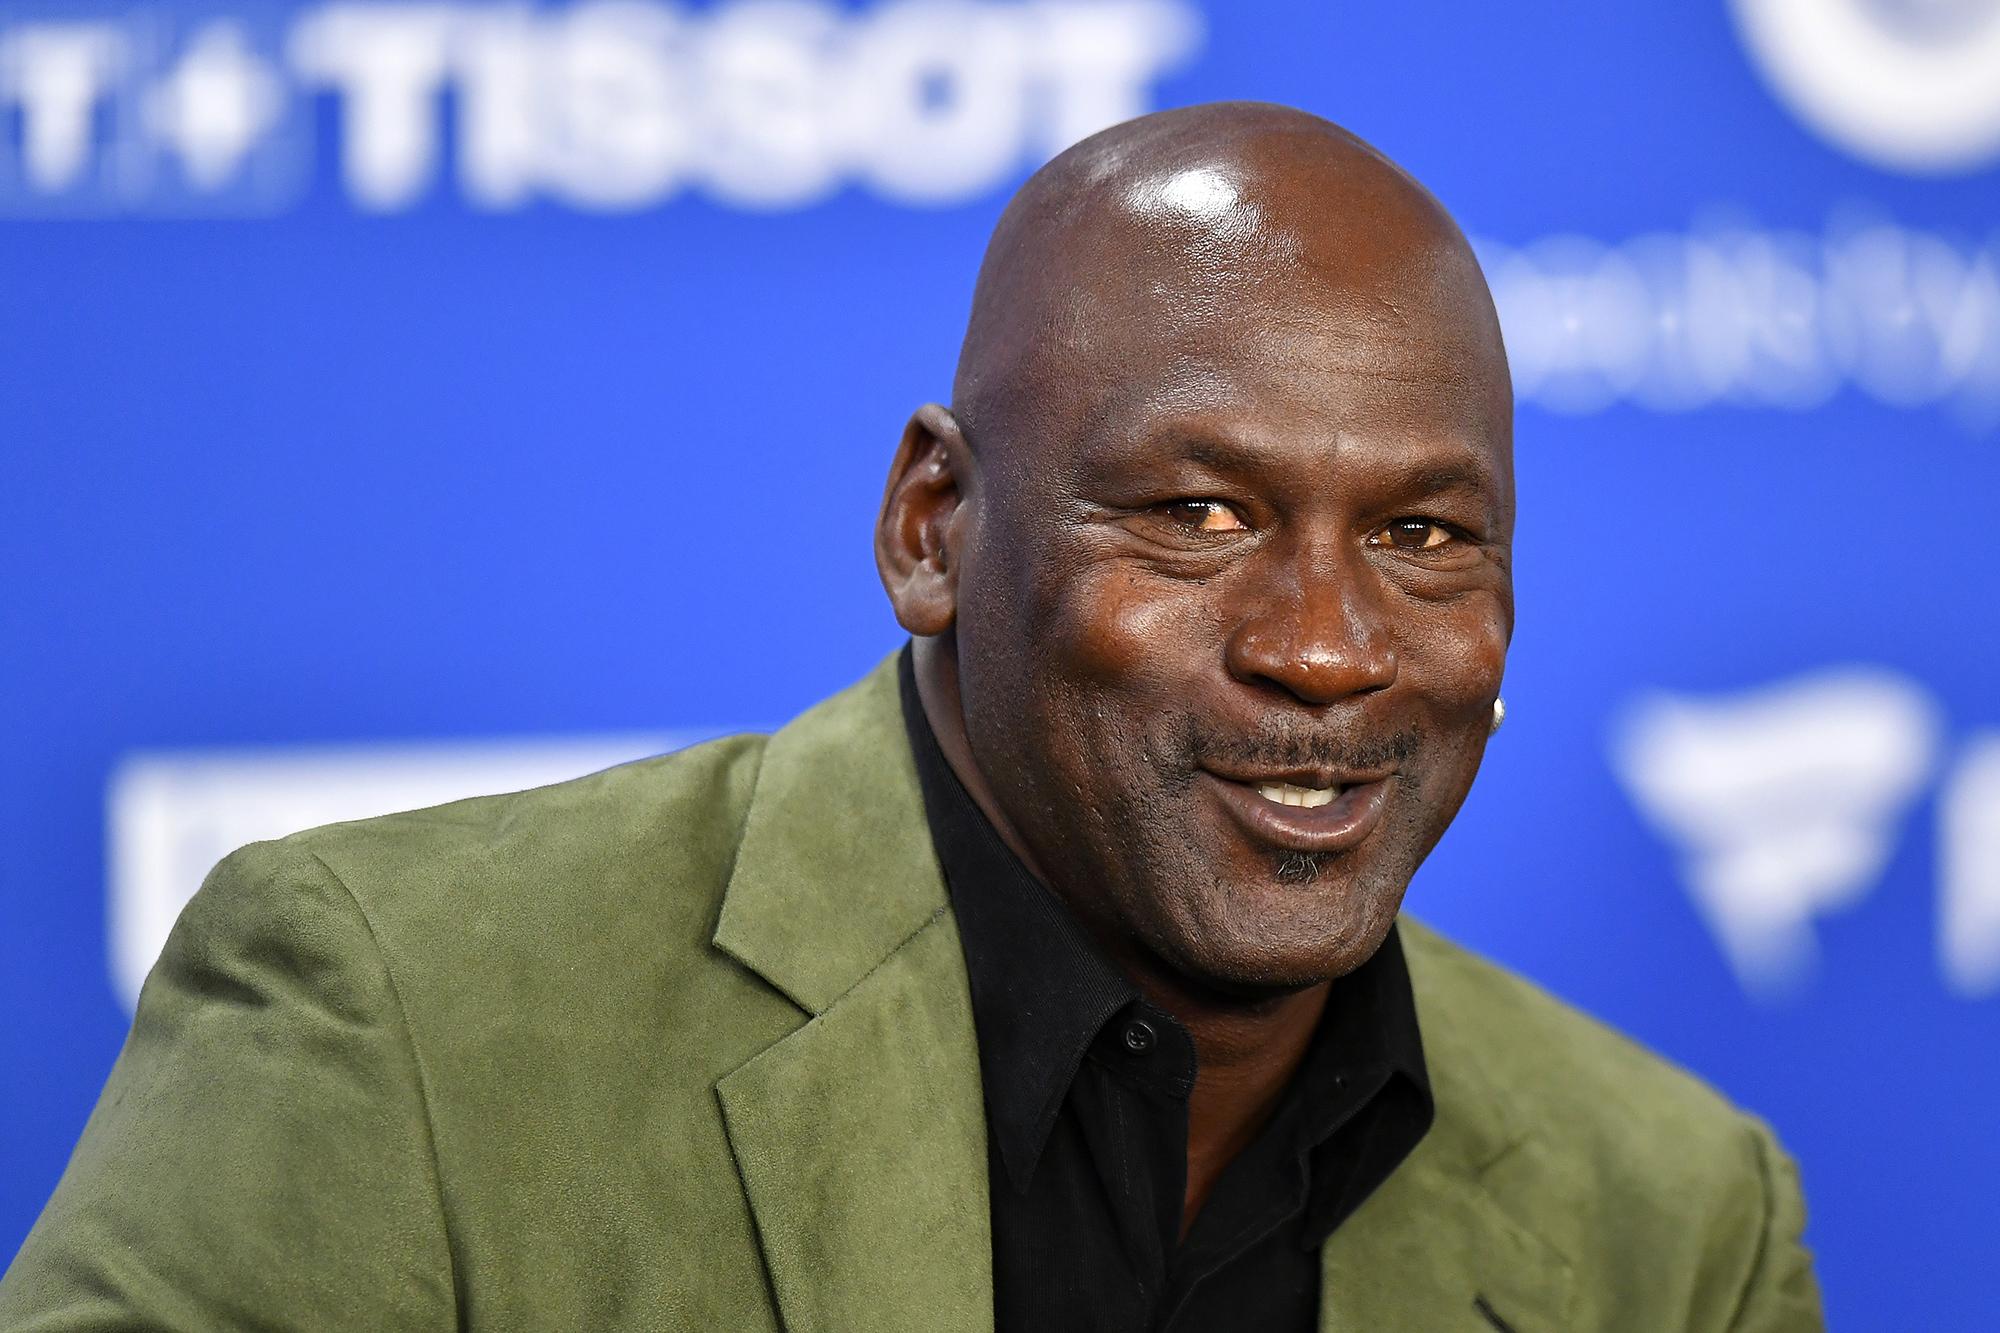 Michael Jordan donating M from 'Last Dance' to Feeding America